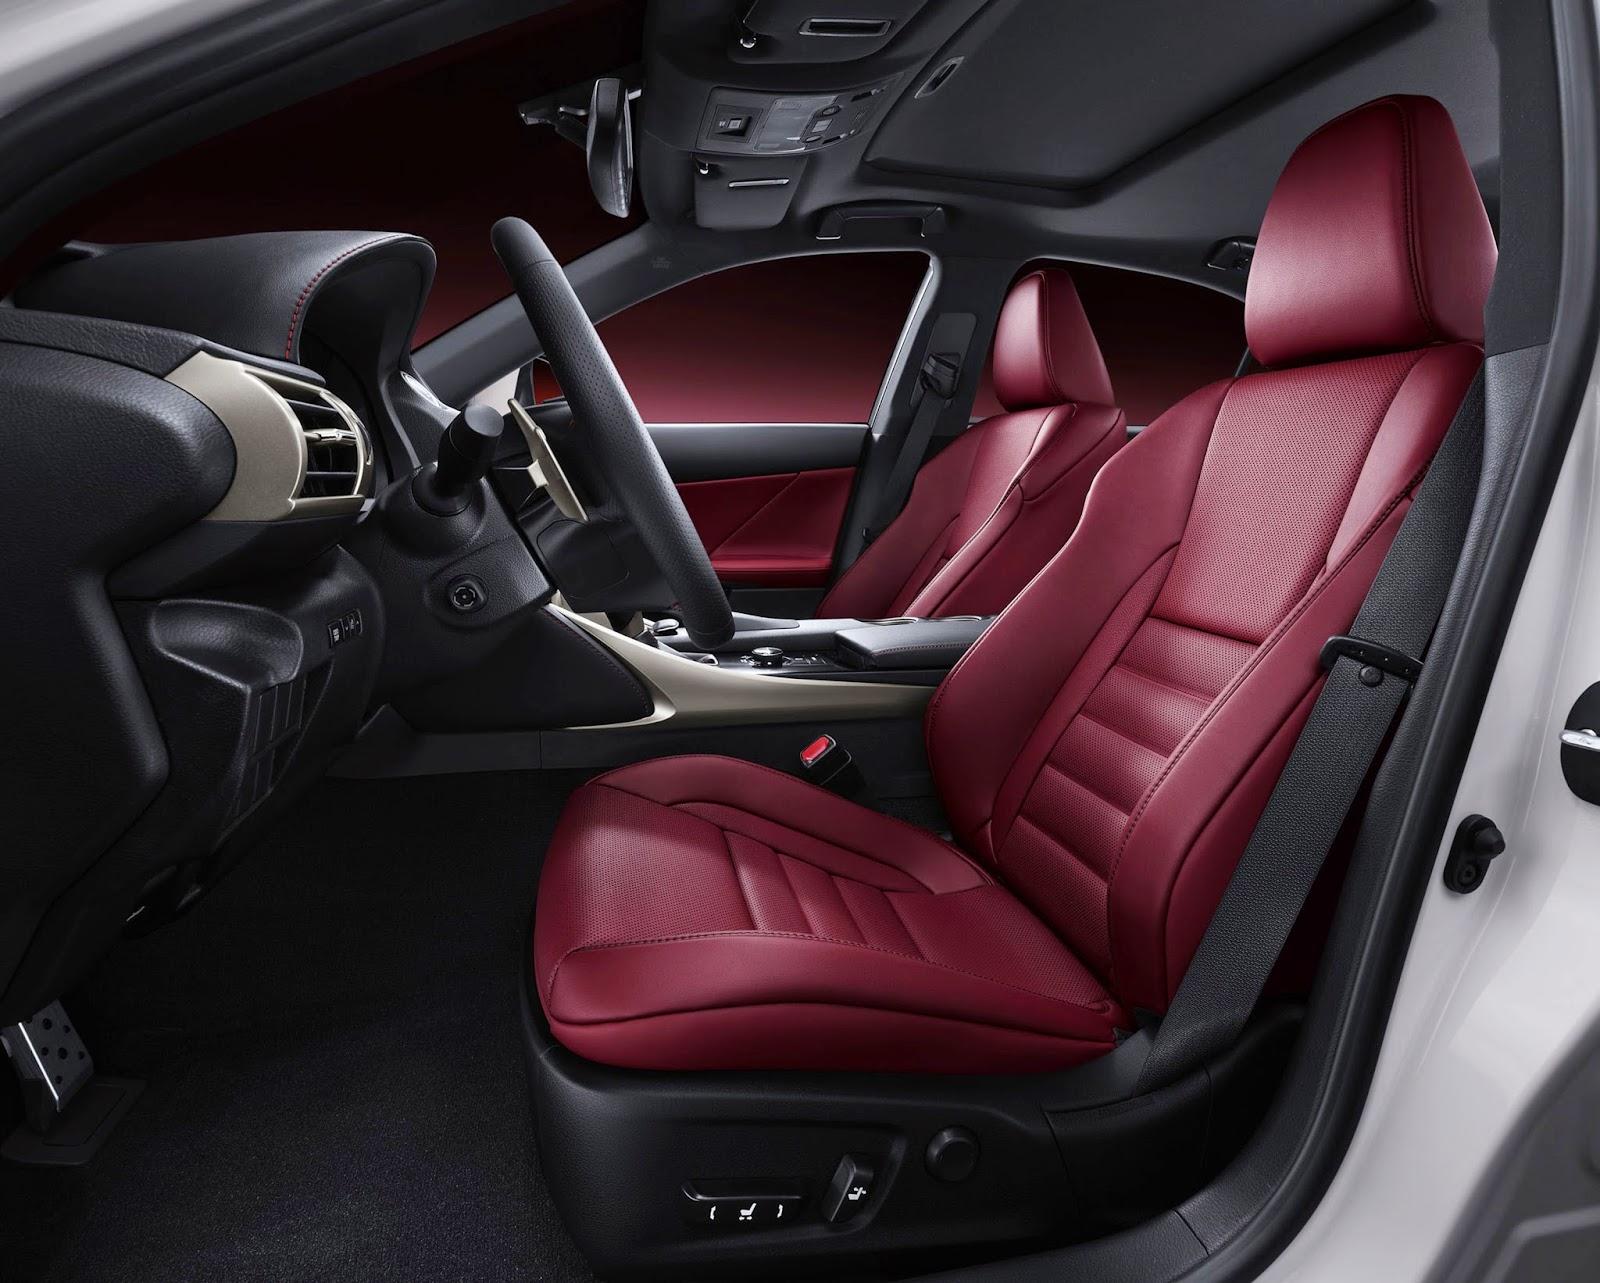 Interior view of 2015 Lexus IS350 F-SPORT